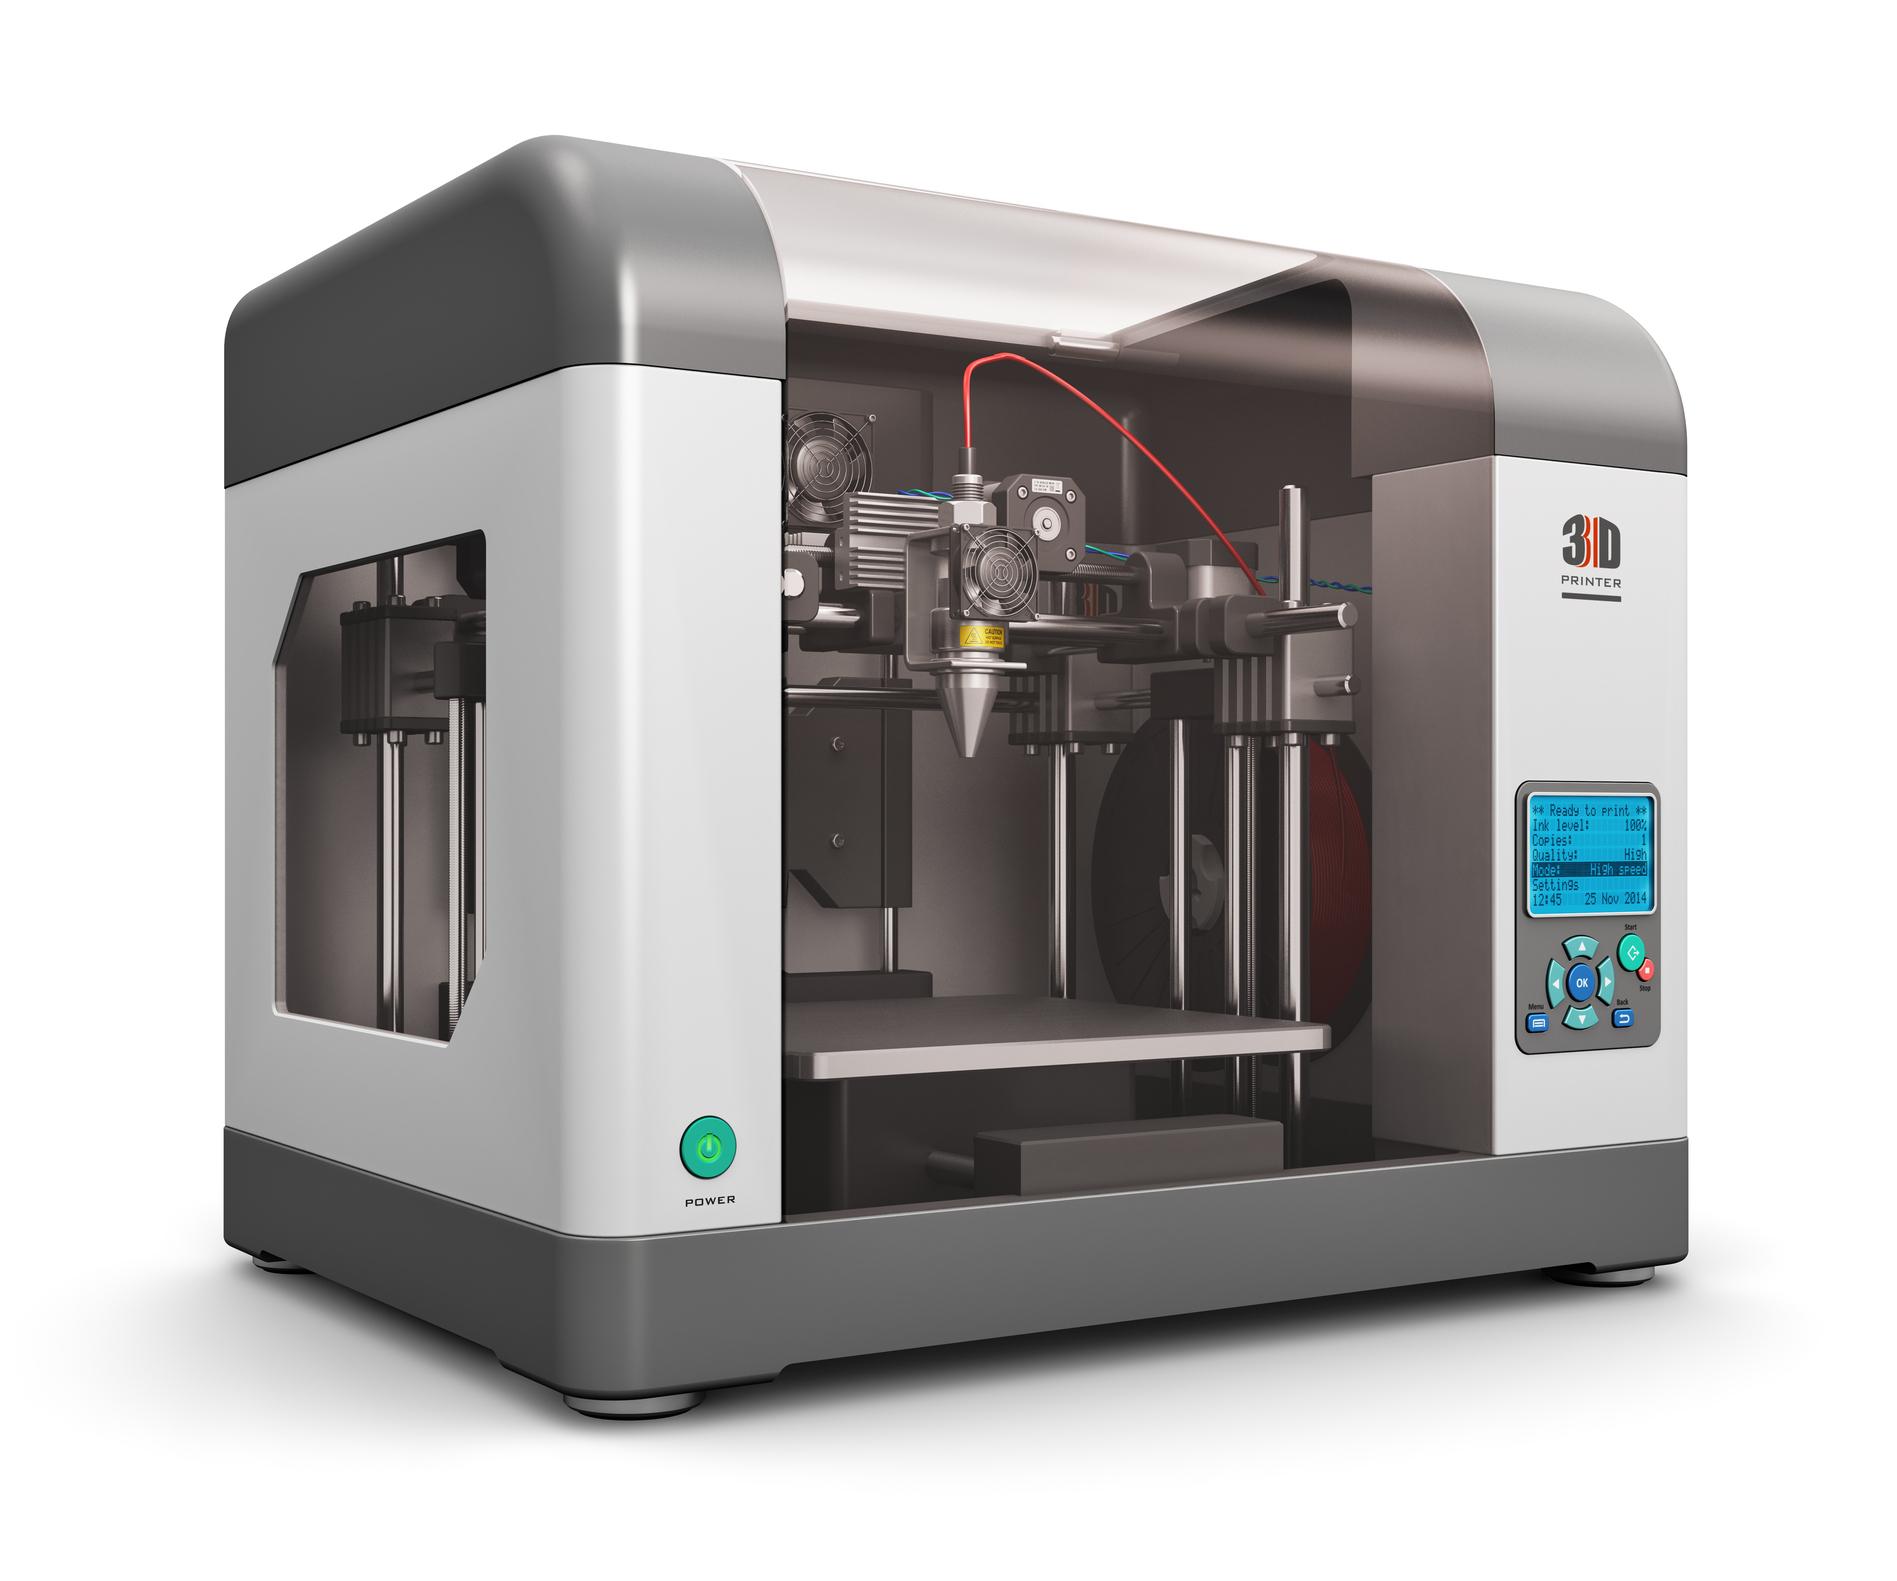 A 3-D printer